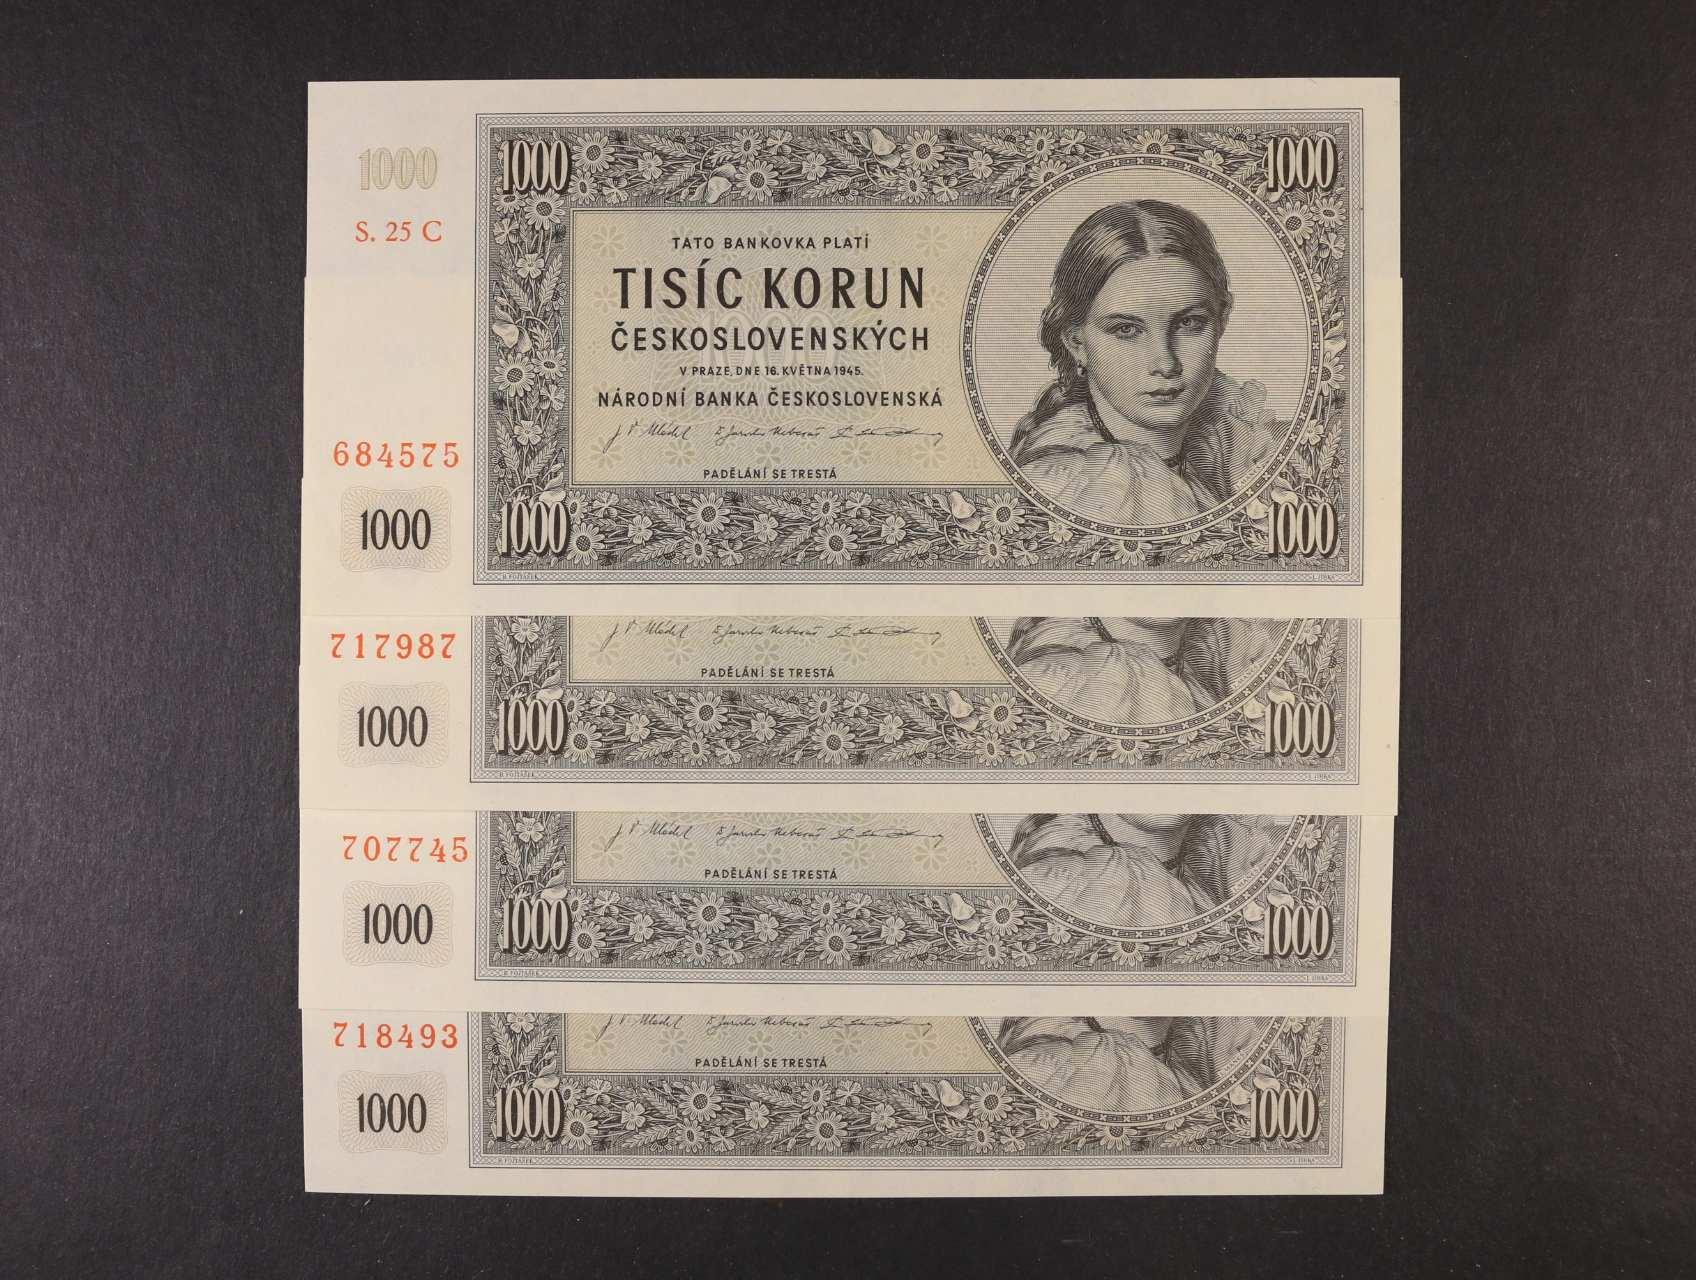 1000 Kčs 16.5.1945 série 05 C, 12 C, 16 C, 25 C, Ba. 78c1, Pi. 74a, 4ks